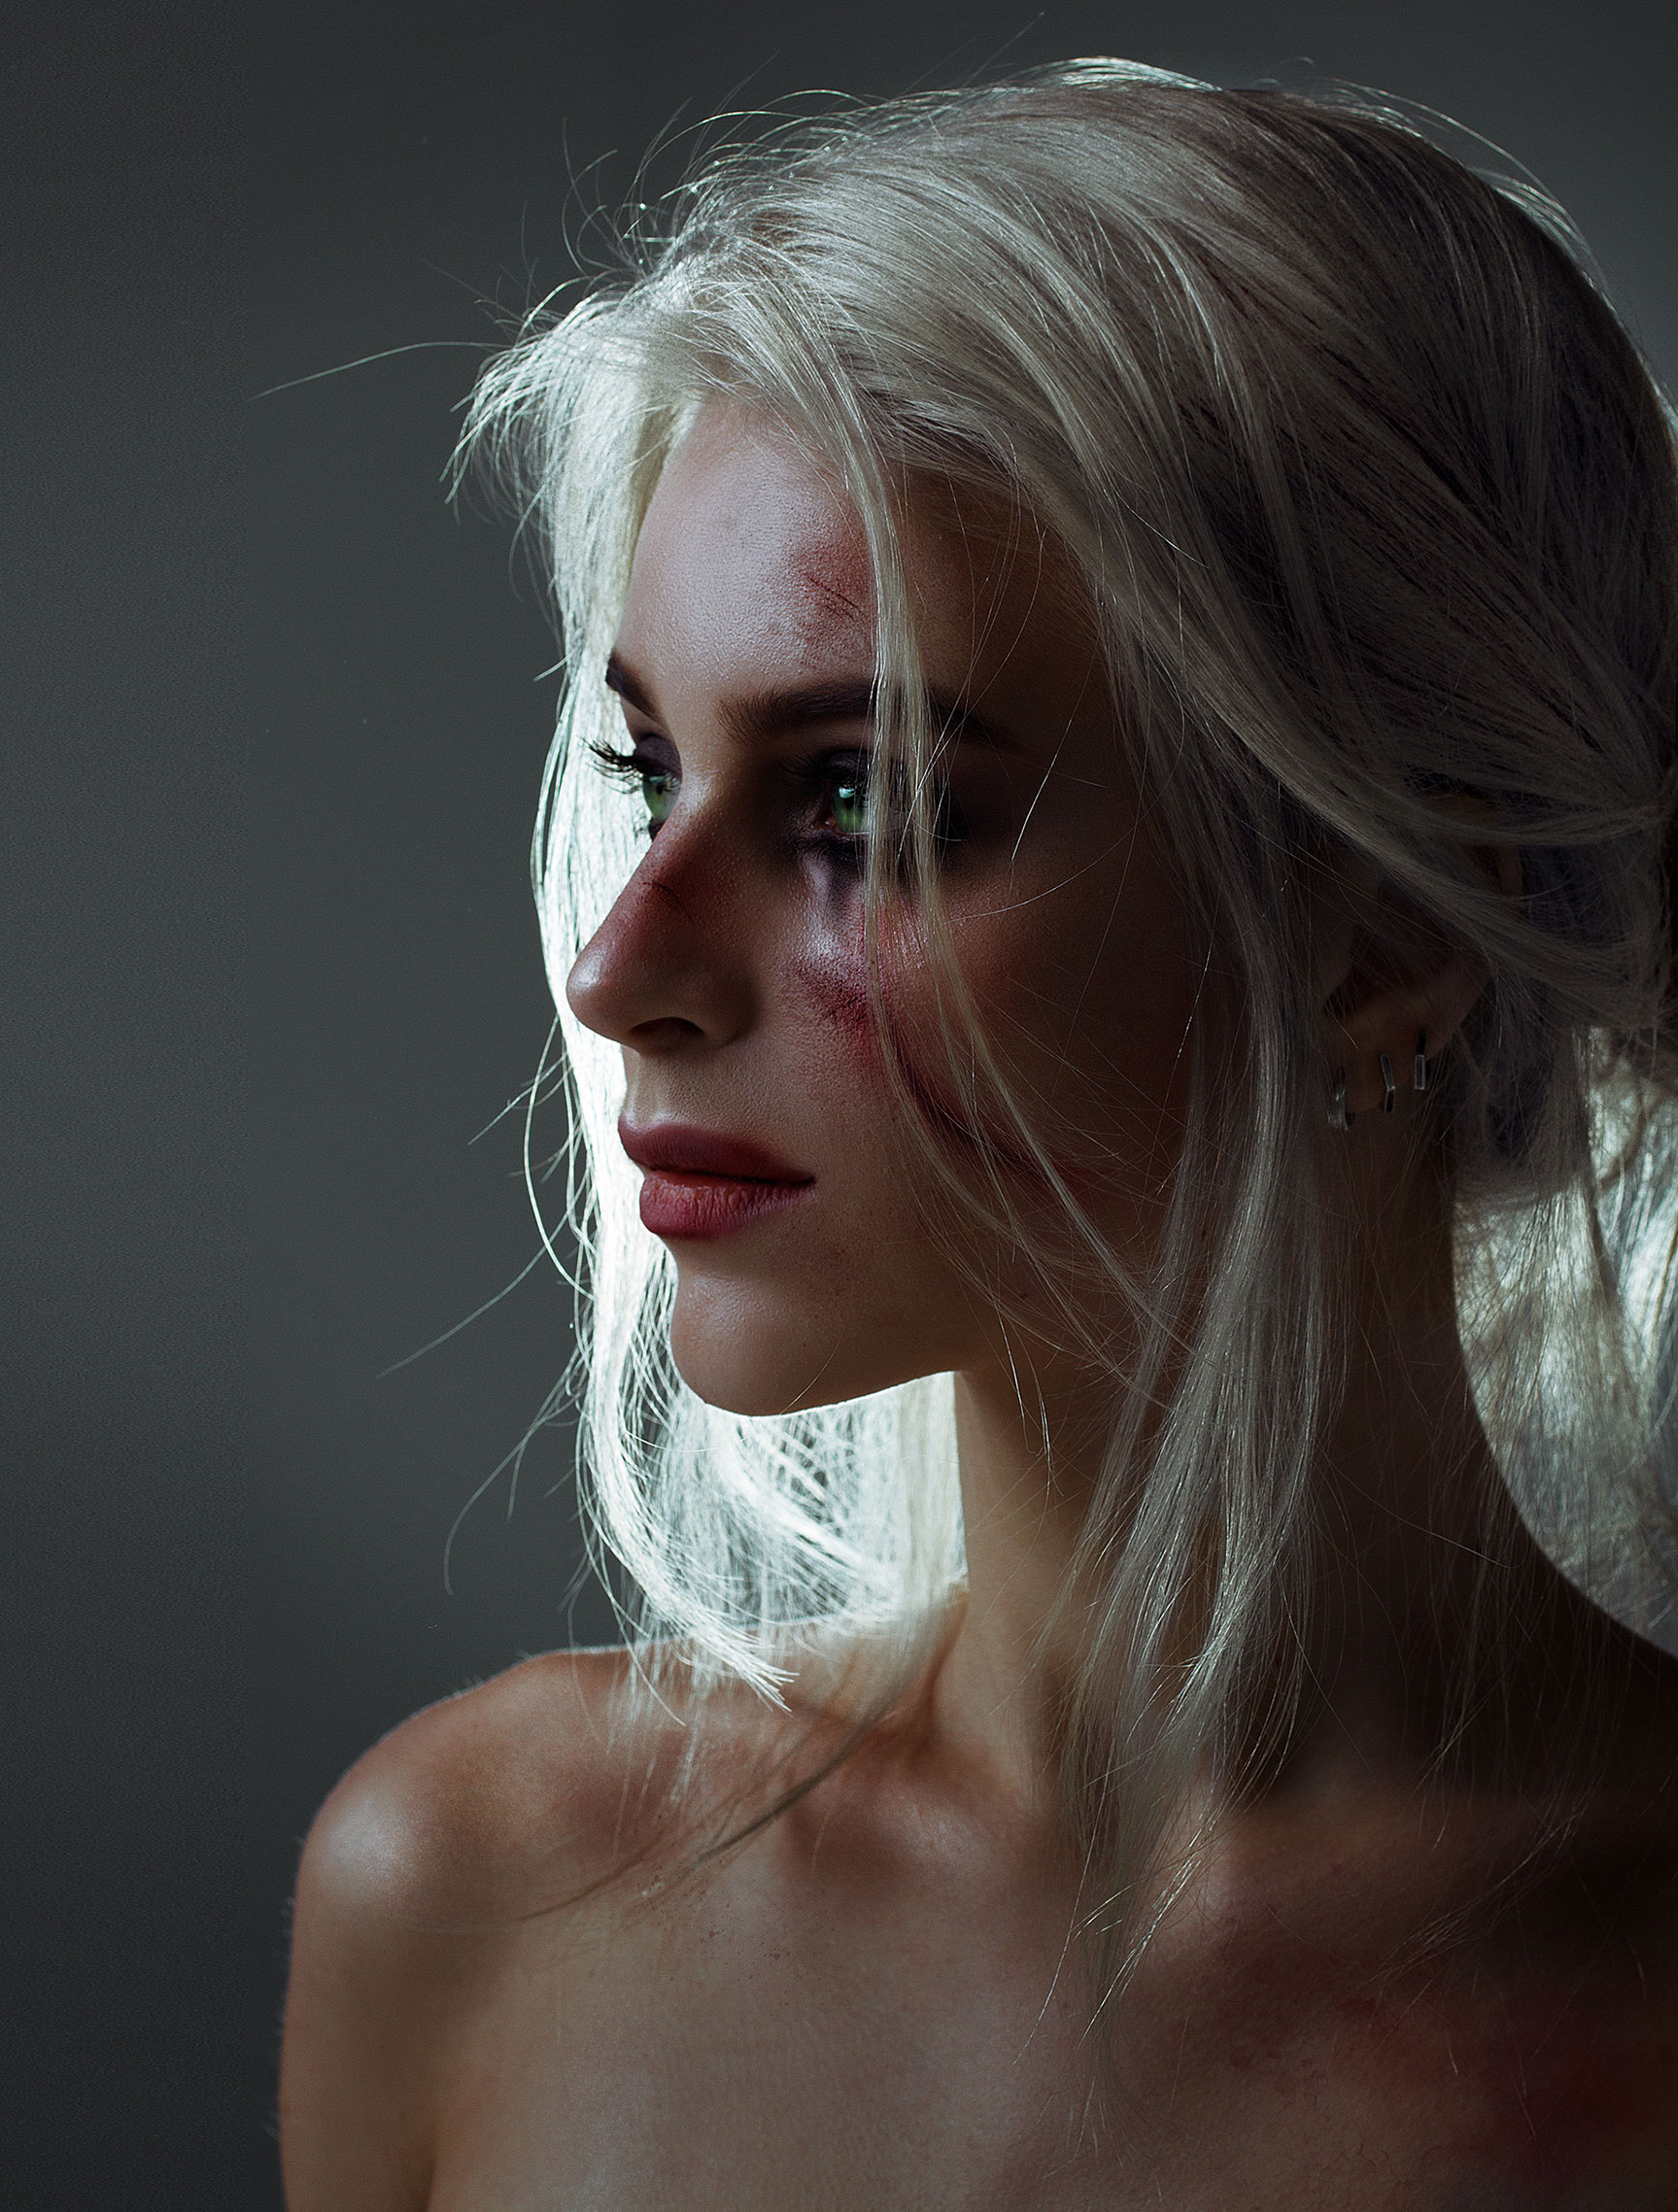 Cosplay / Katie Kosova / Катя Косова в роли Cirilla из игры The Witcher 3 / фотограф Tim Rise